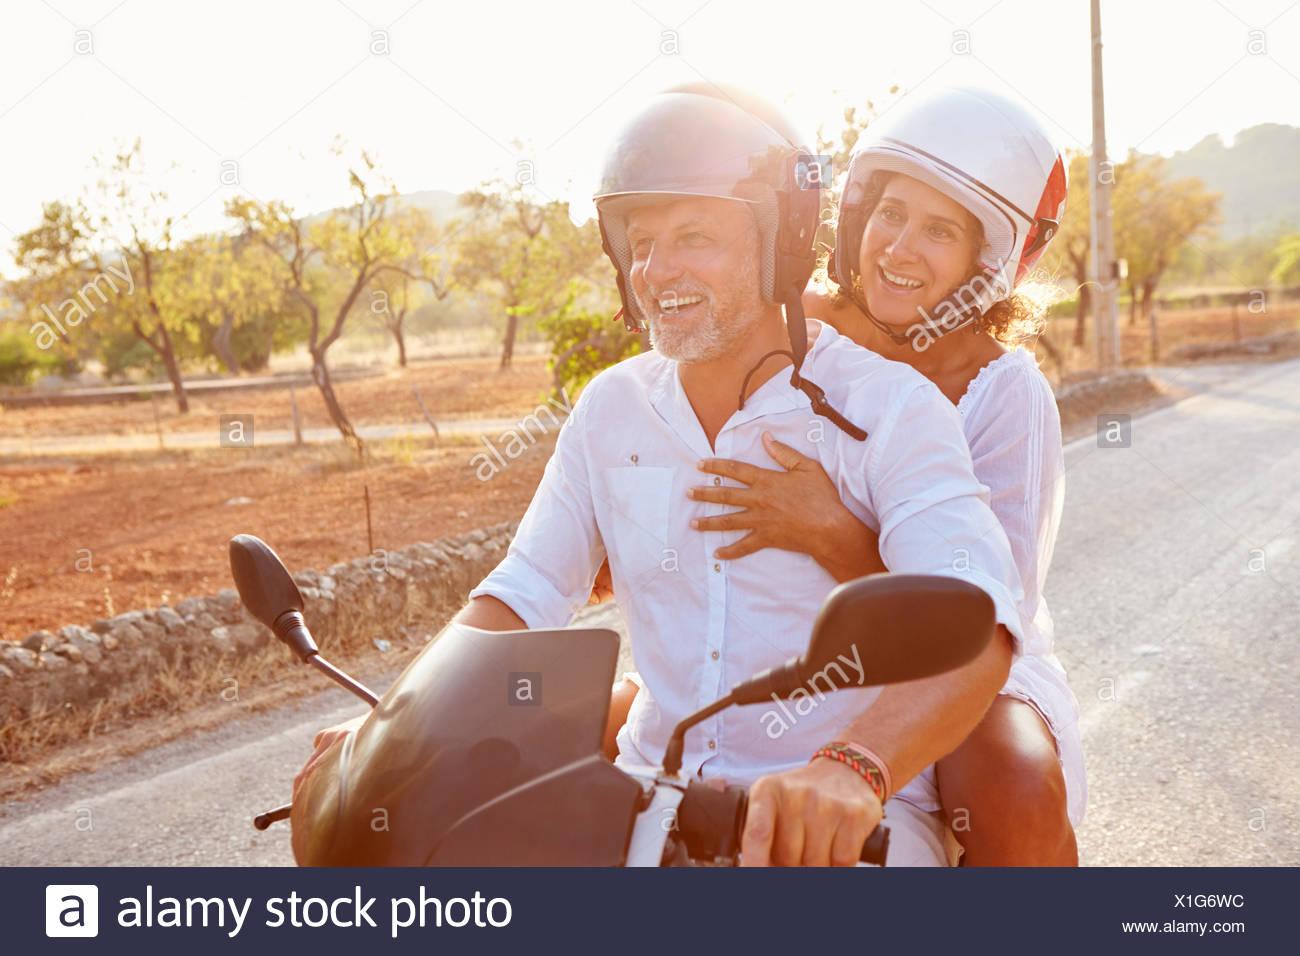 two men riding motorcycle along stock photos & two men riding